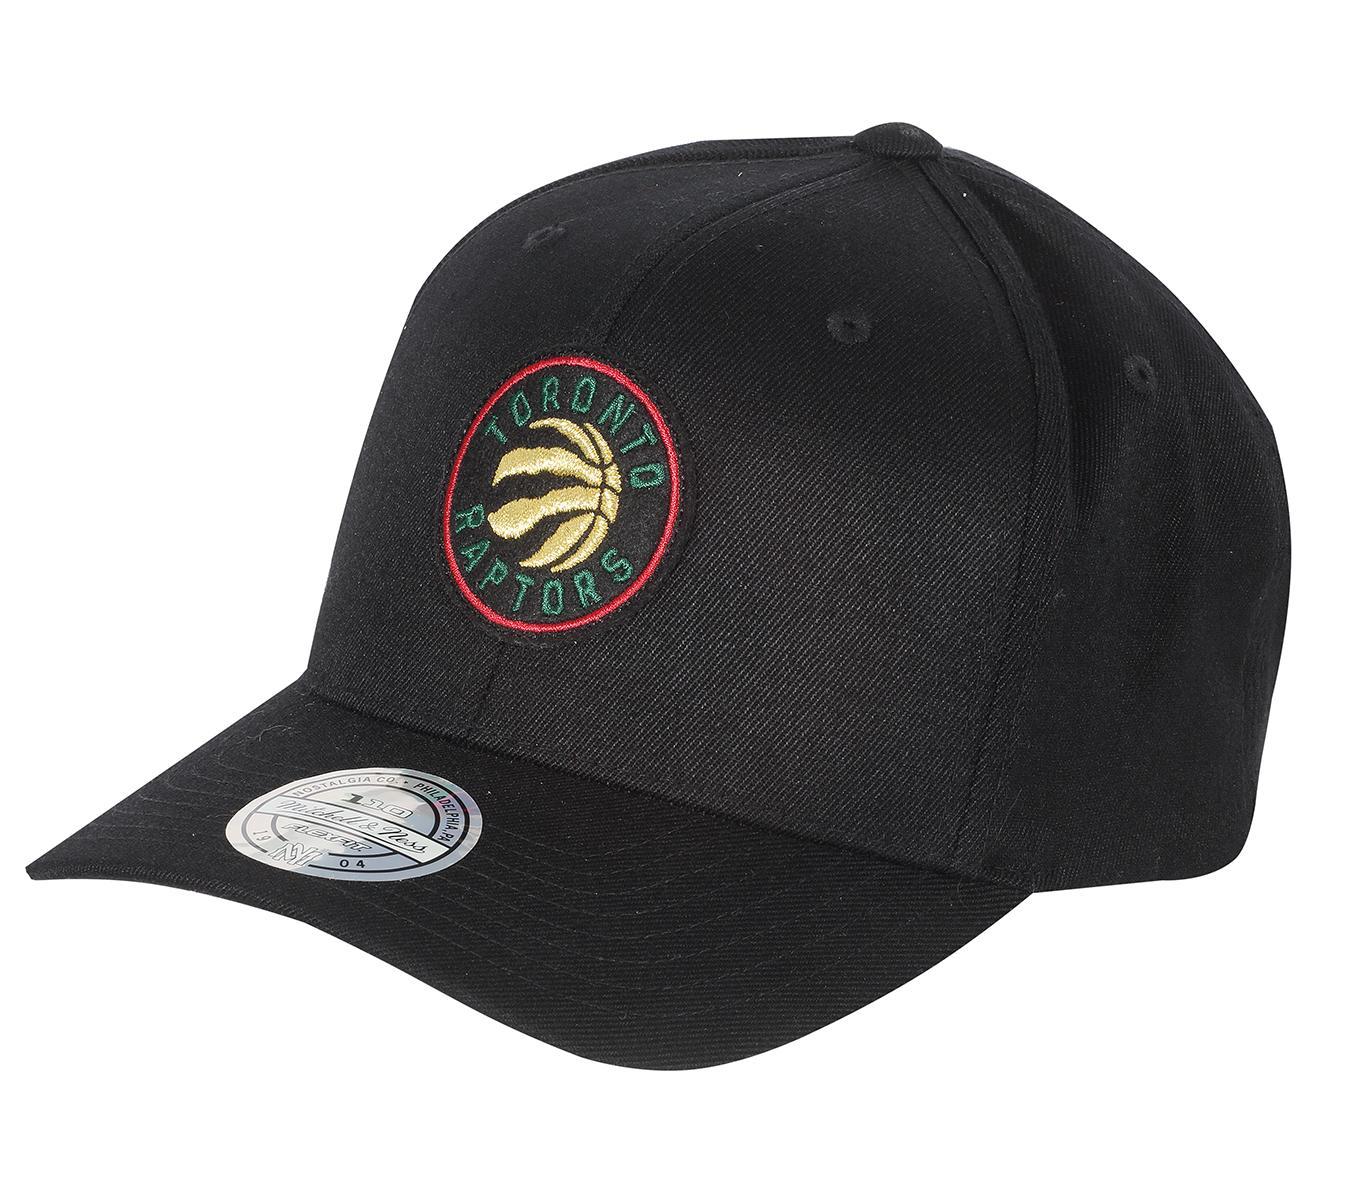 e7daf801750 Luxe 110 Snapback Toronto Raptors